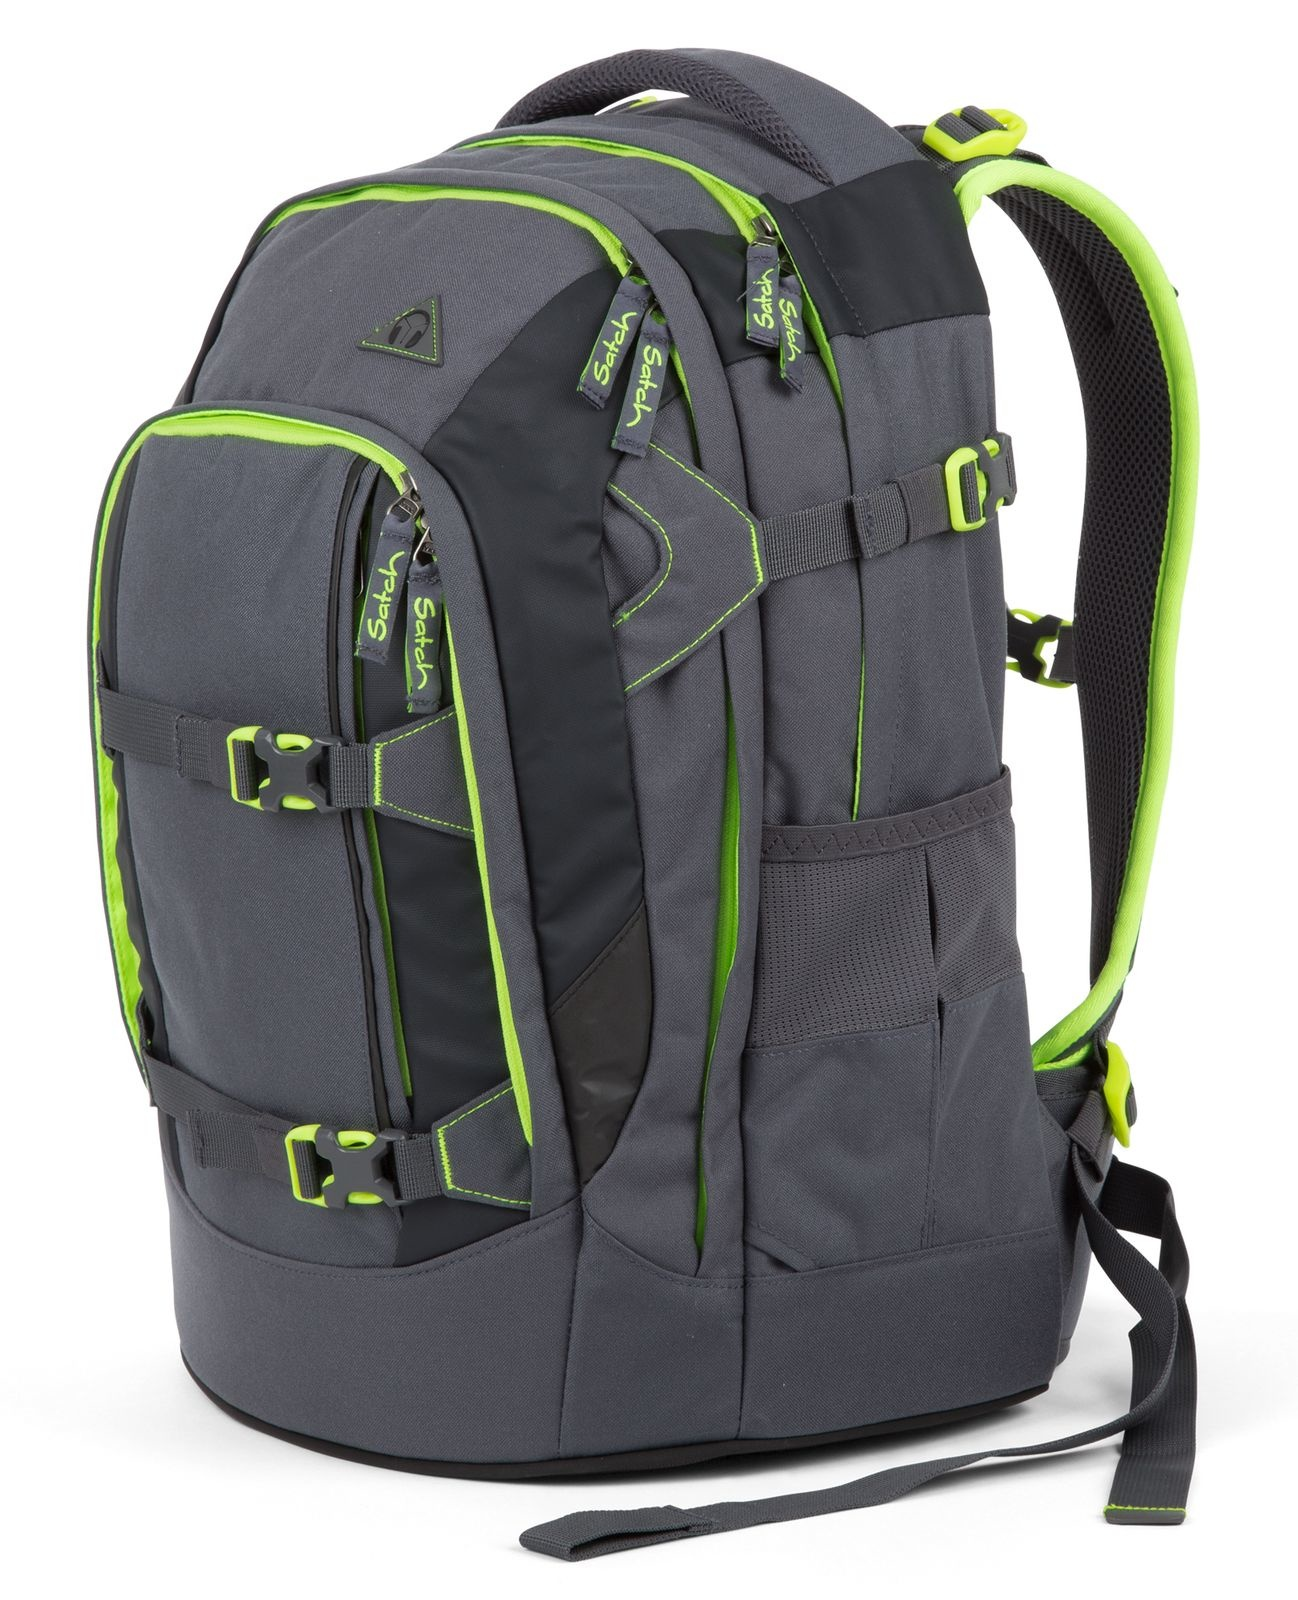 Satch Satch Pack School Rugzak - 30 liter backpack - Phantom